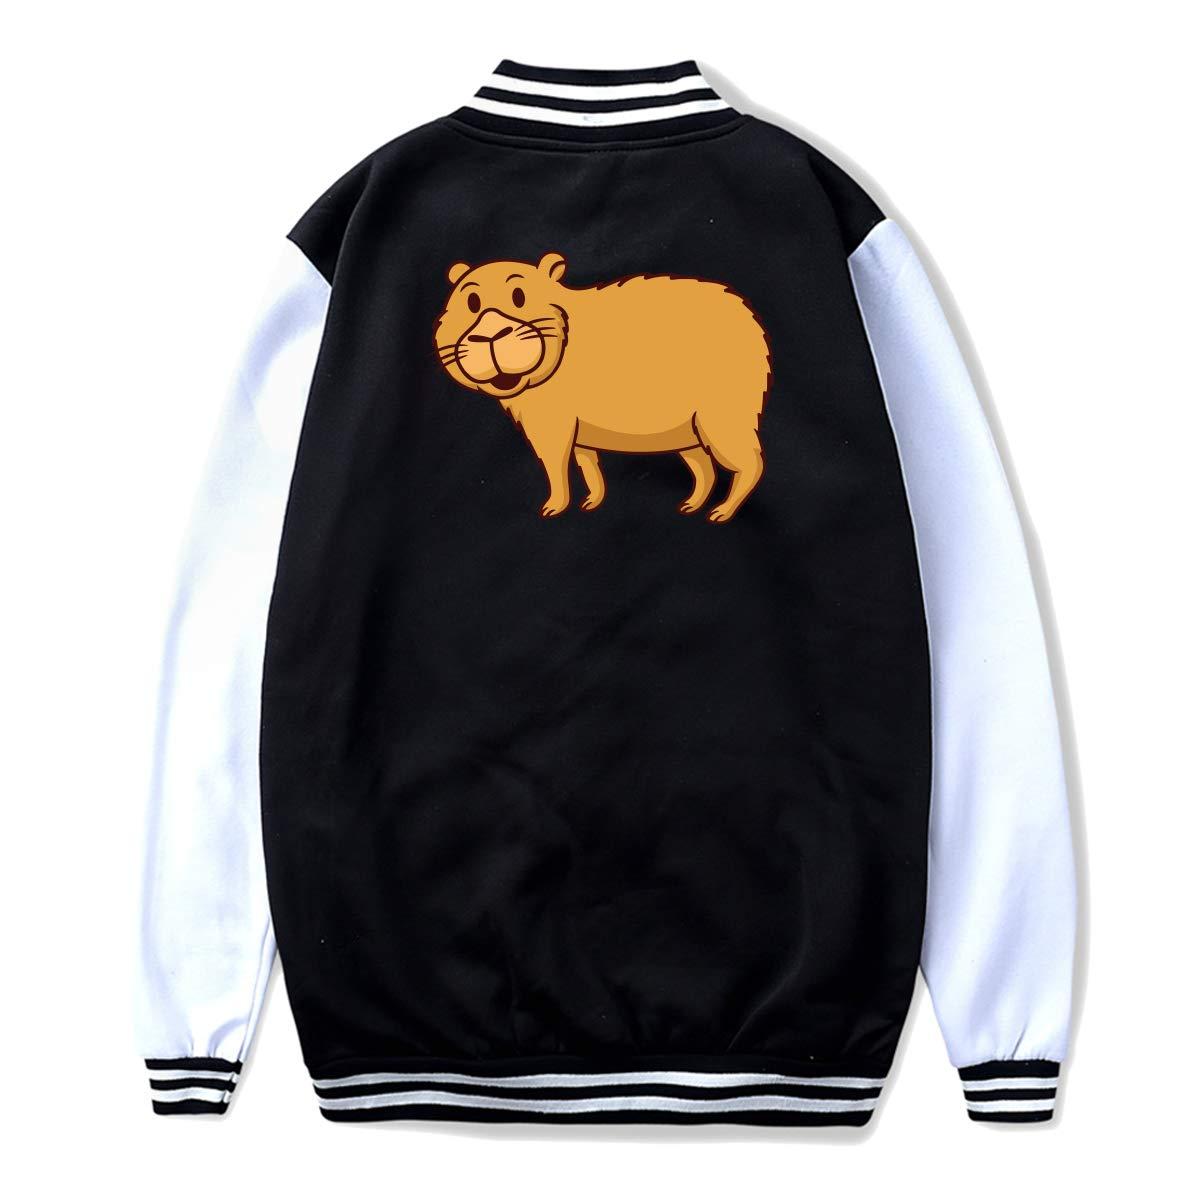 Back Print NJKM5MJ Unisex Youth Baseball Uniform Jacket Capybara Cartoon Coat Sport Outfit